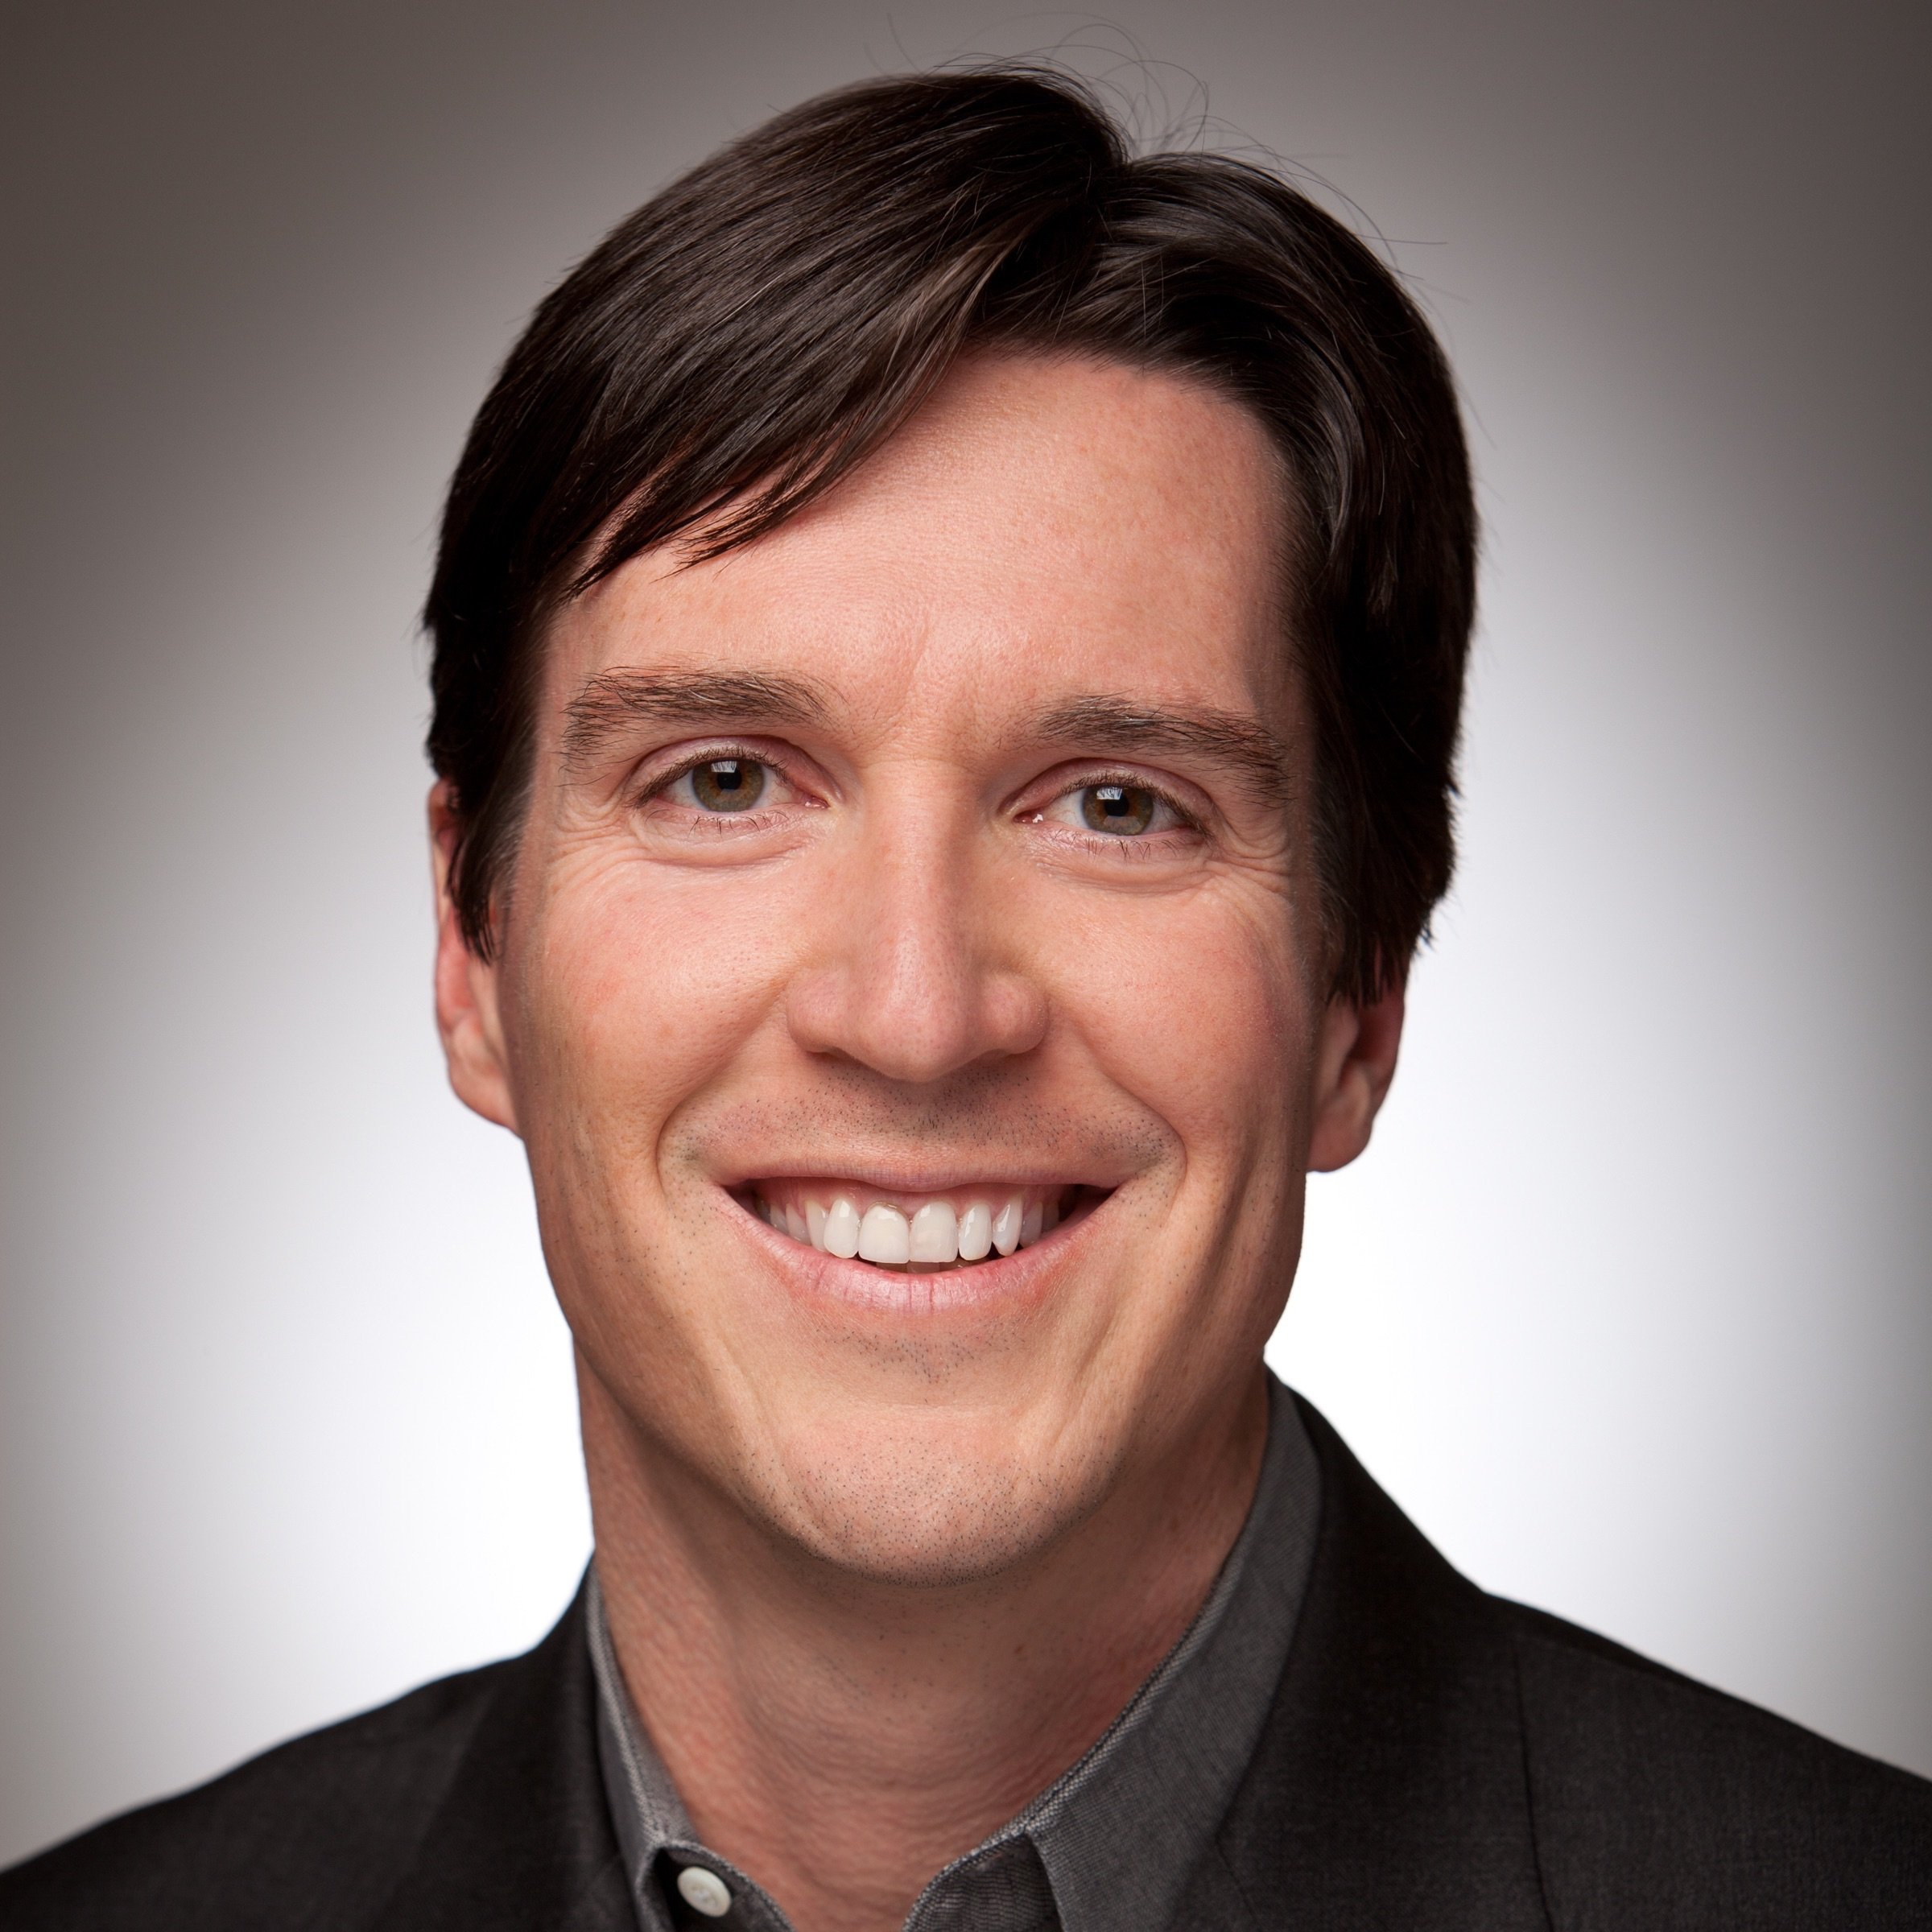 Craig Hancock